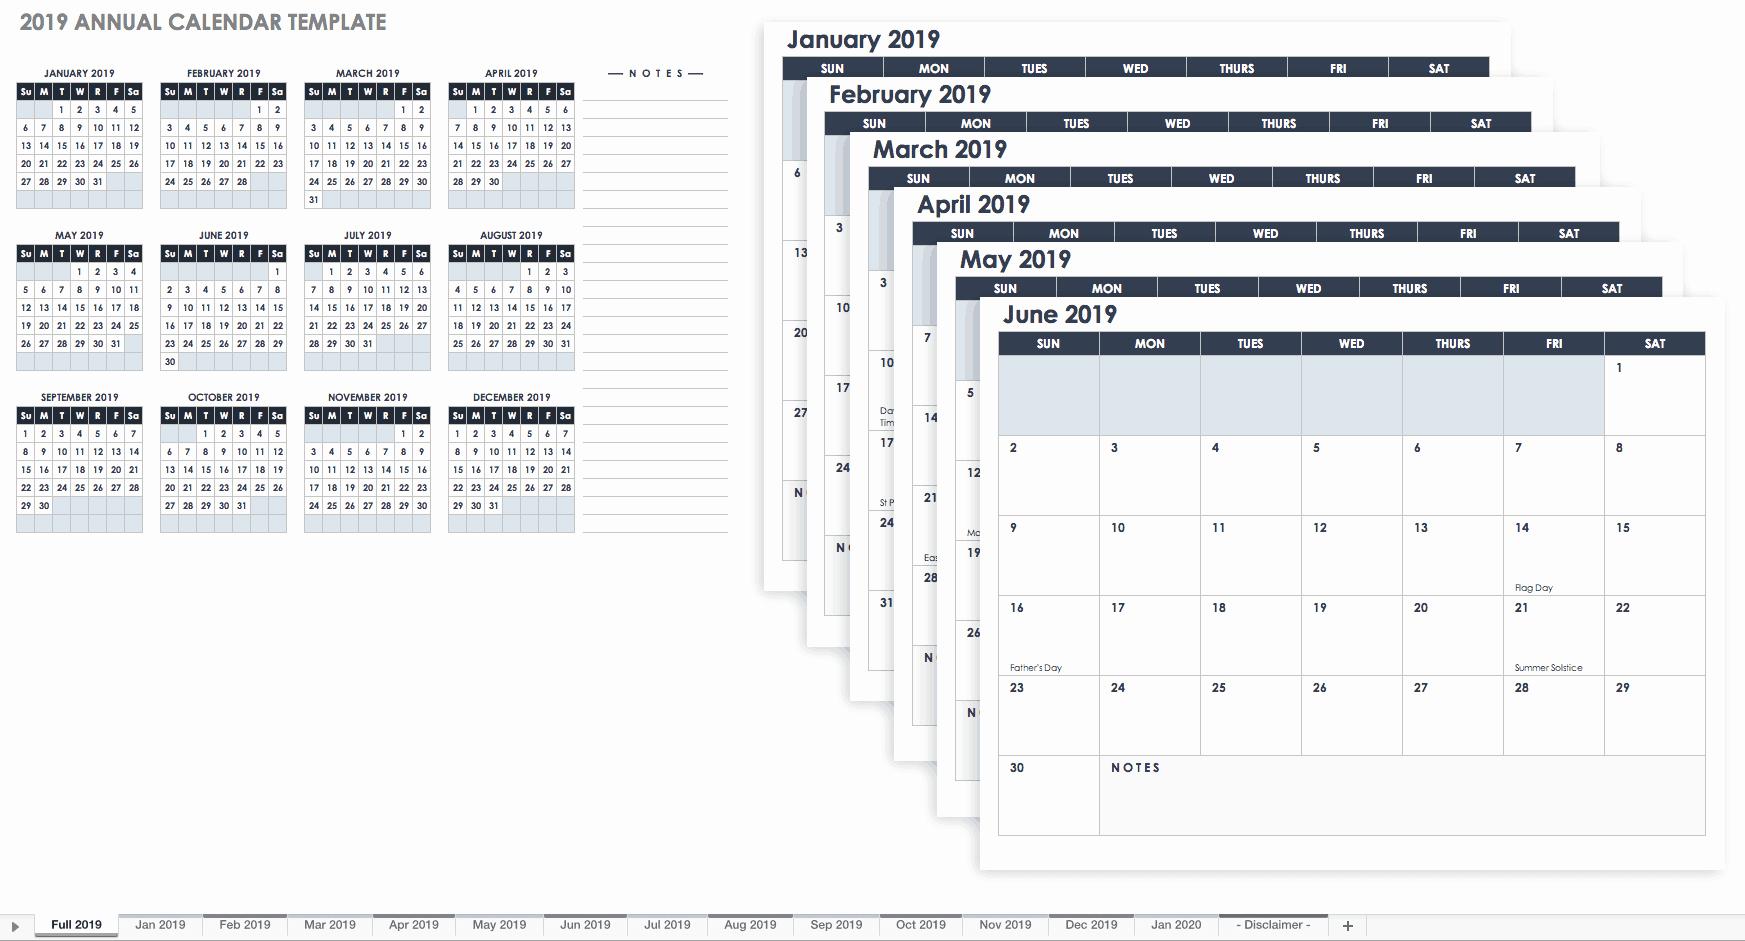 Excel Calendar 2019 Template Inspirational 15 Free Monthly Calendar Templates